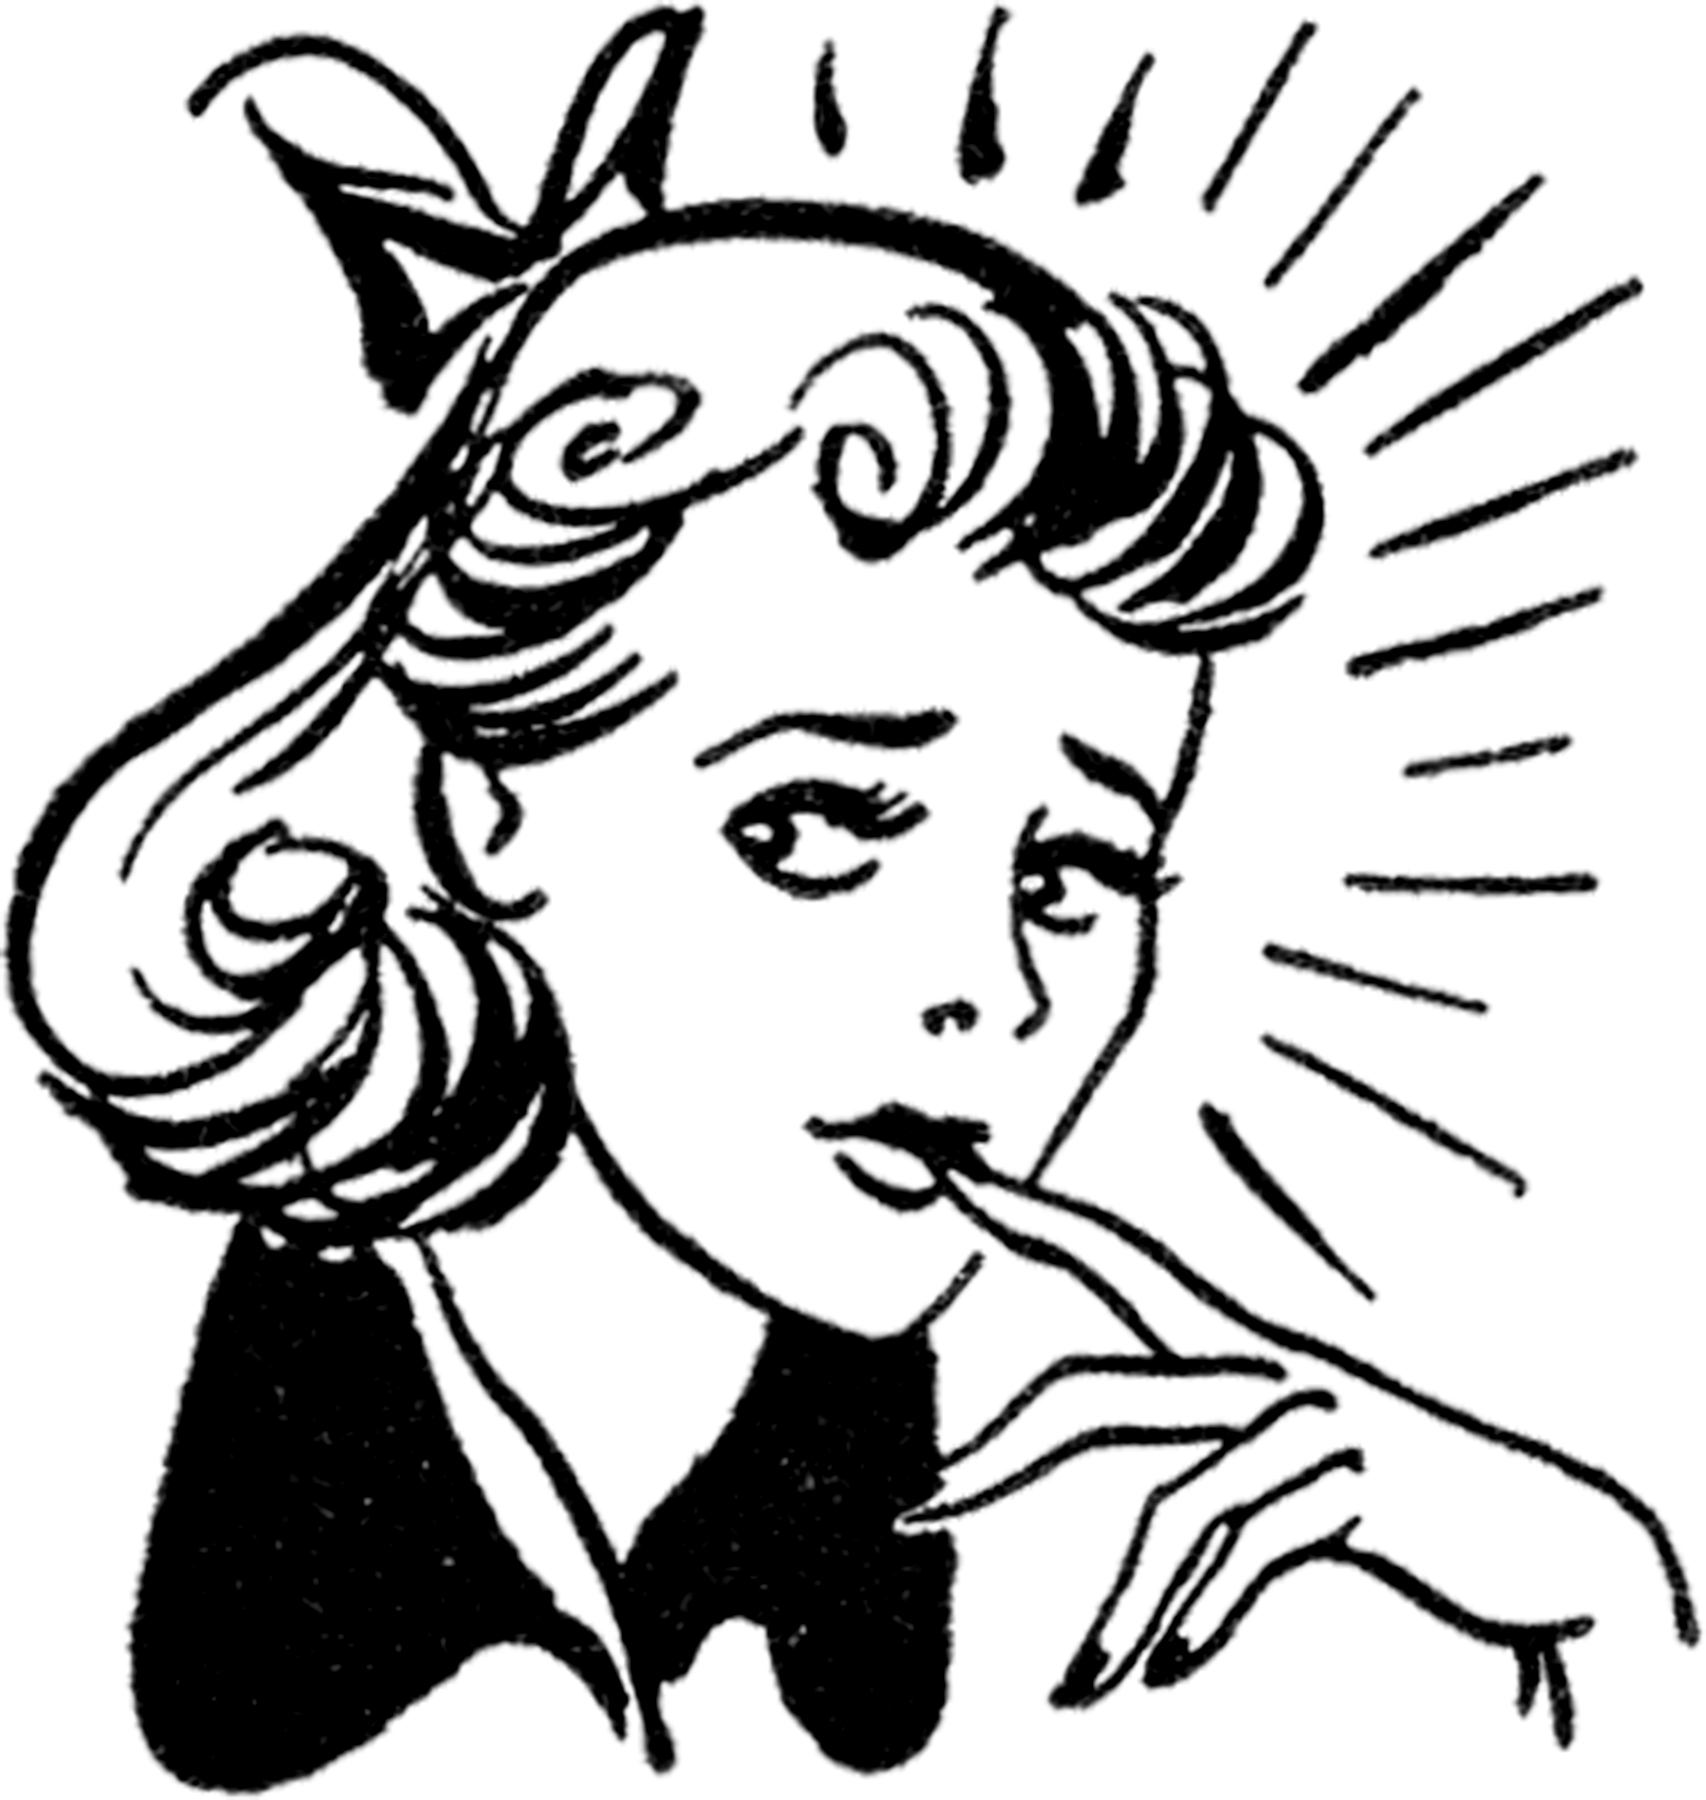 Retro Nervous Lady Image The Graphics Fairy